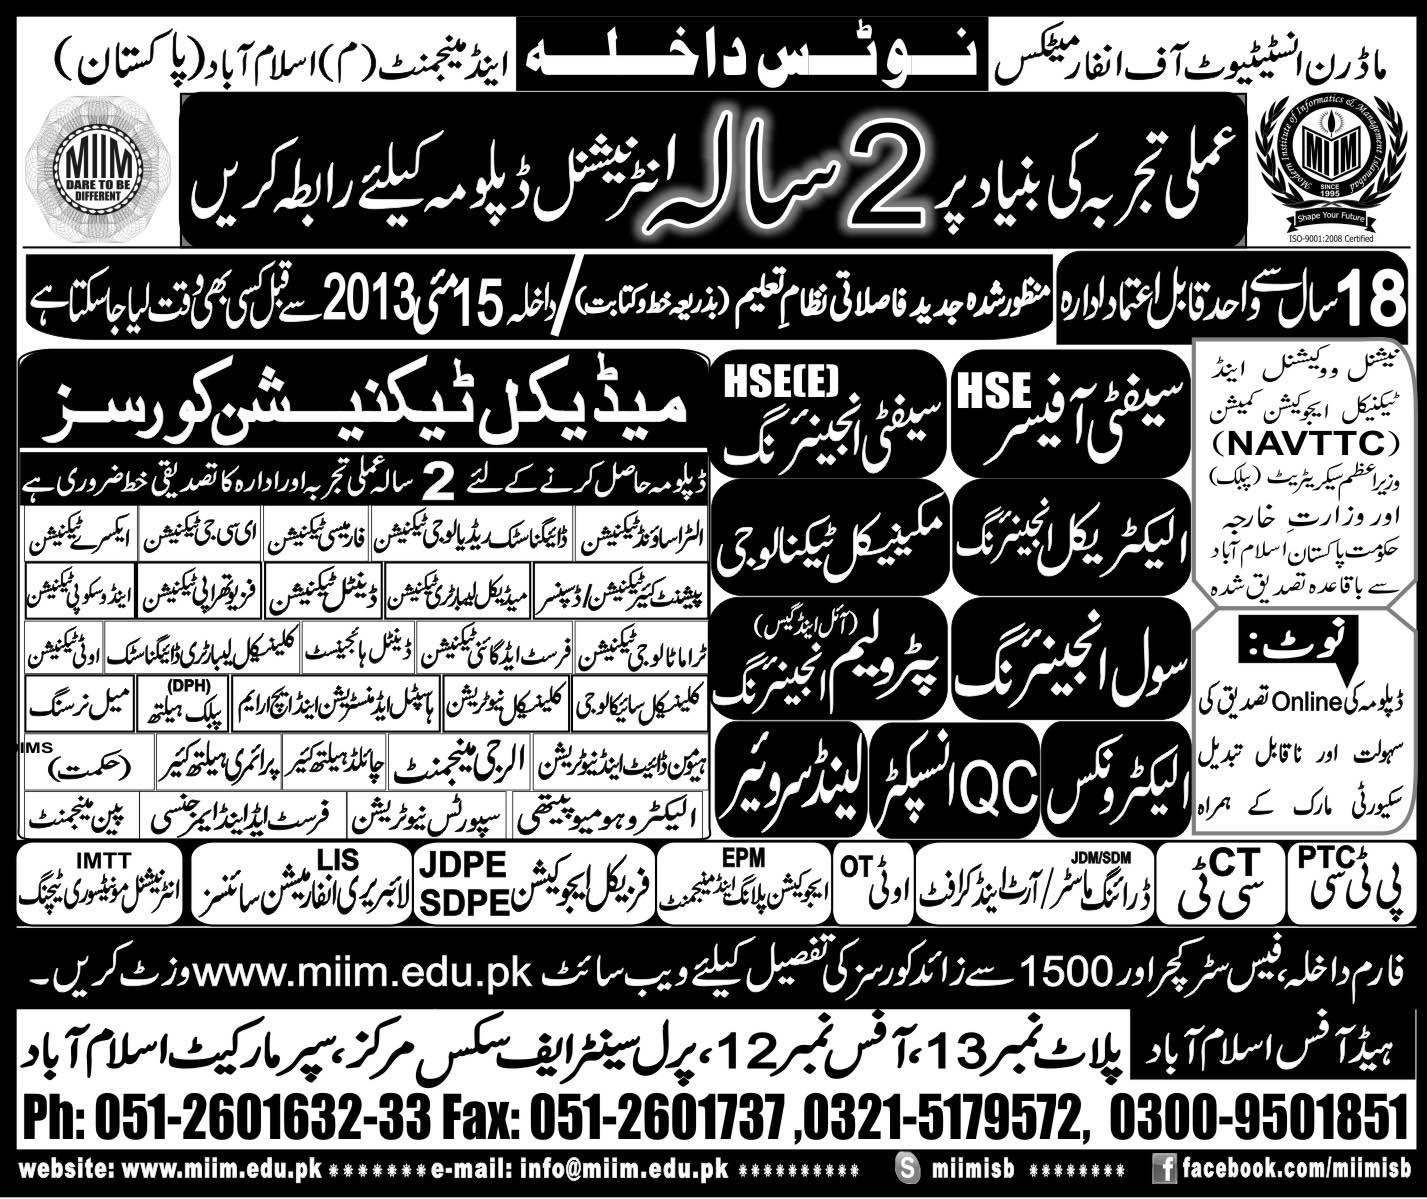 Local Newspaper Add Jang Rawalpindi – The MIIM Islamabad